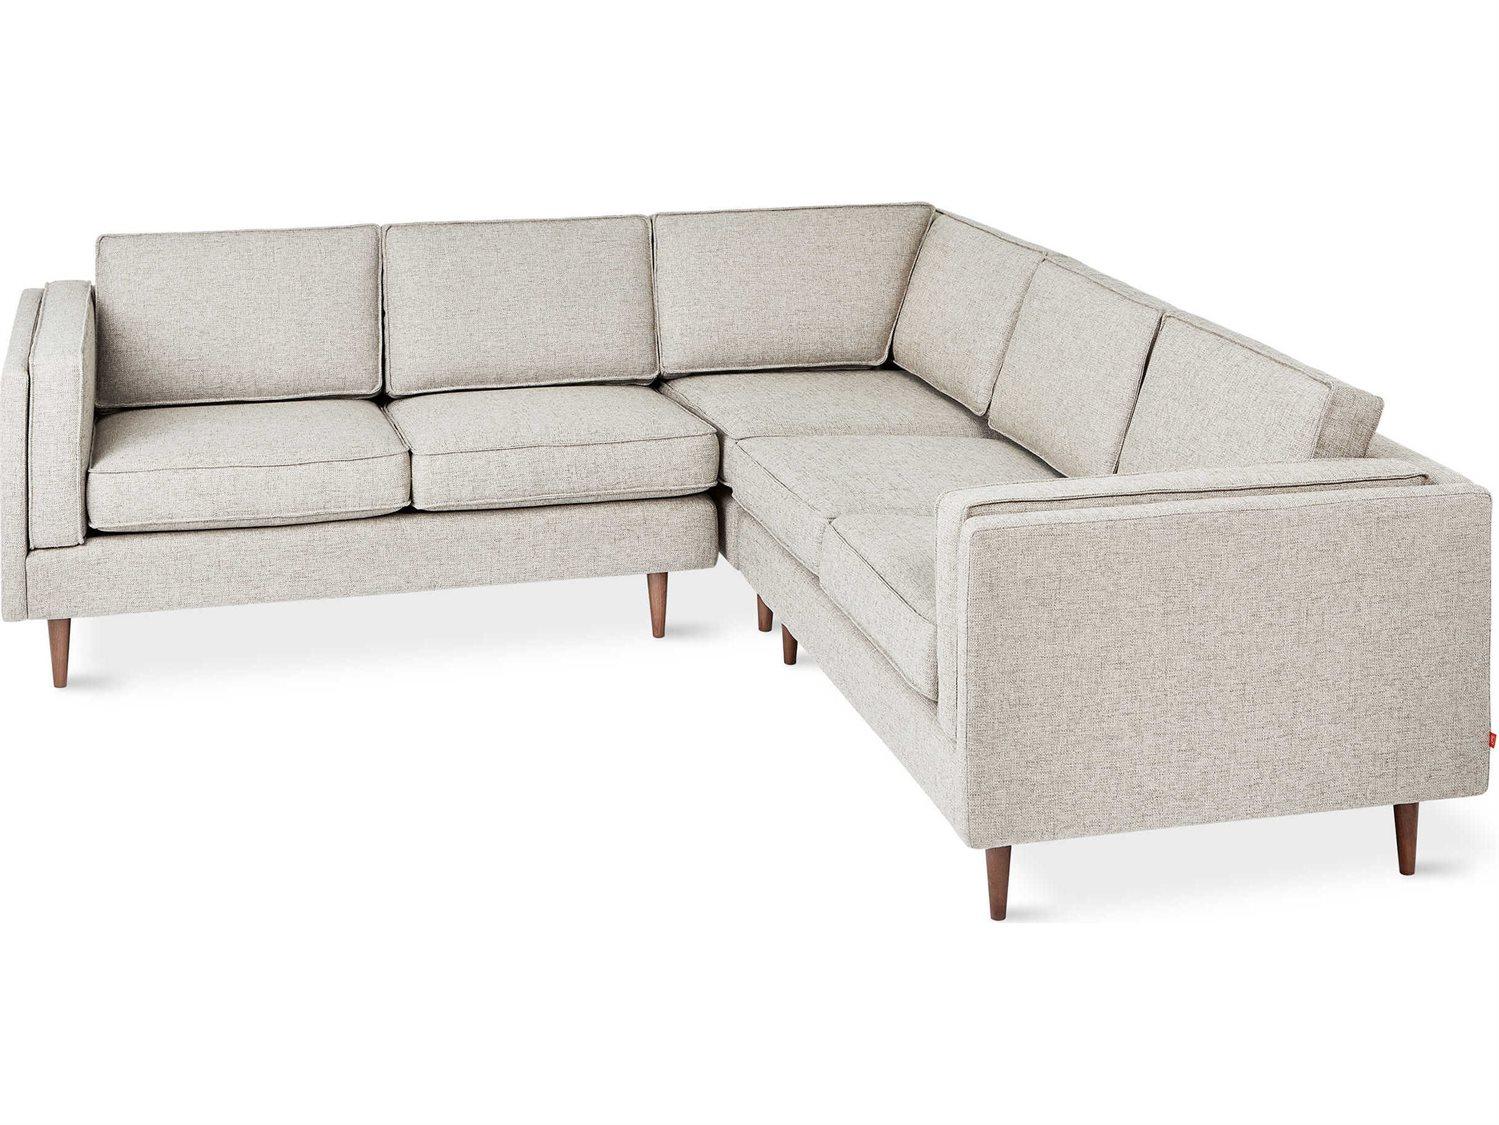 Prime Gus Modern Adelaide Leaside Driftwood Sectional Sofa Open Box Beatyapartments Chair Design Images Beatyapartmentscom